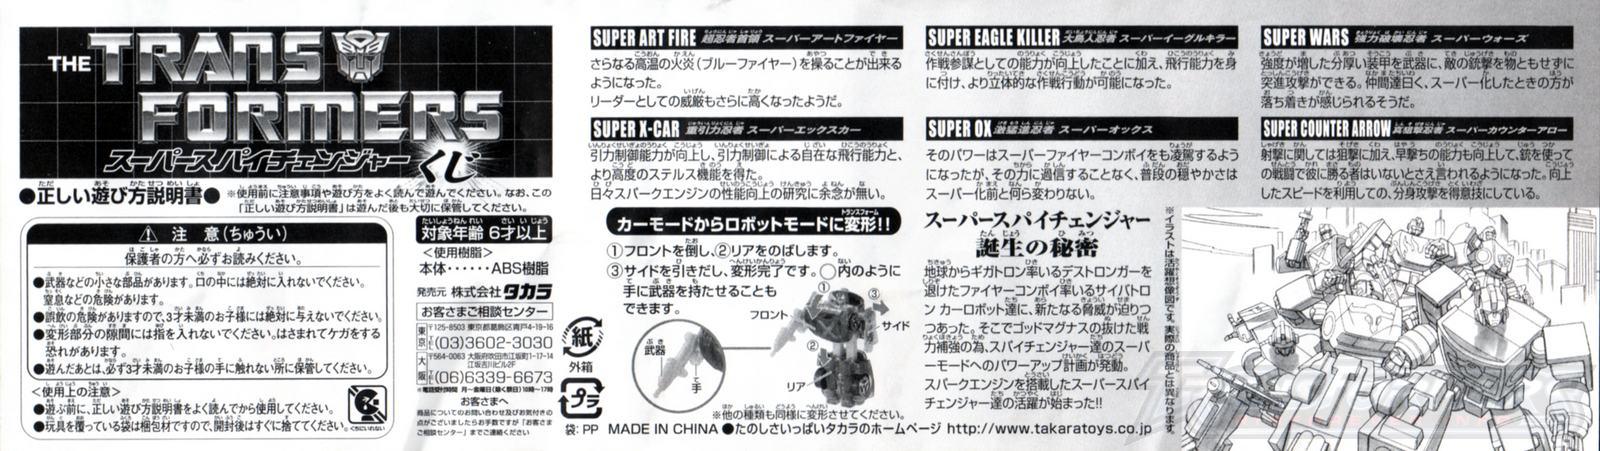 Super-Spychangers-Back